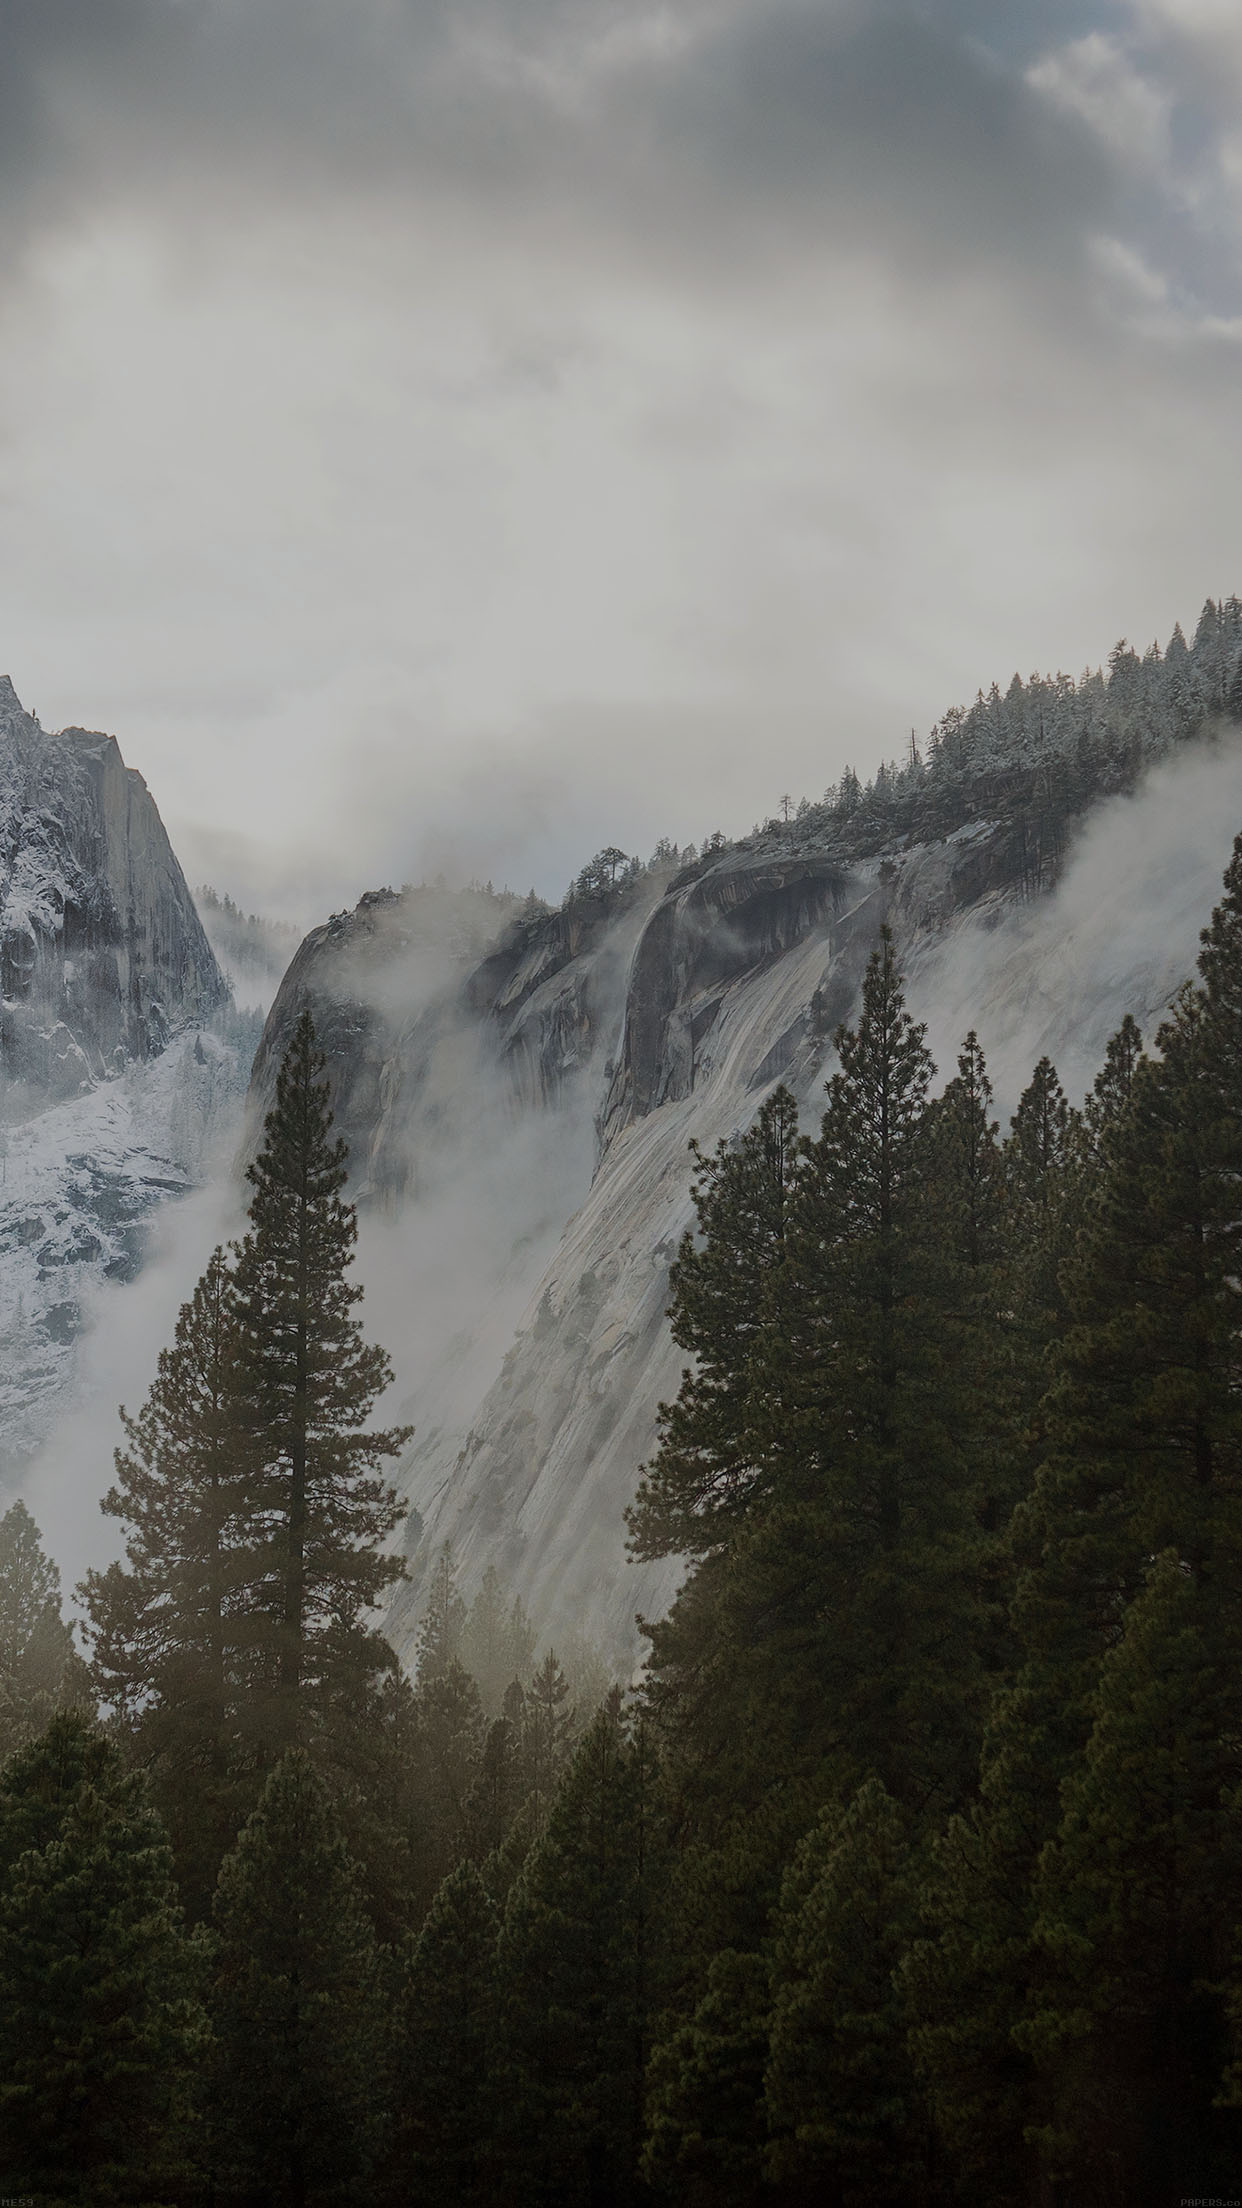 Yosemite Snow Dark Mountain Nature Android Wallpaper - Nature Wallpaper Iphone 8plus - HD Wallpaper